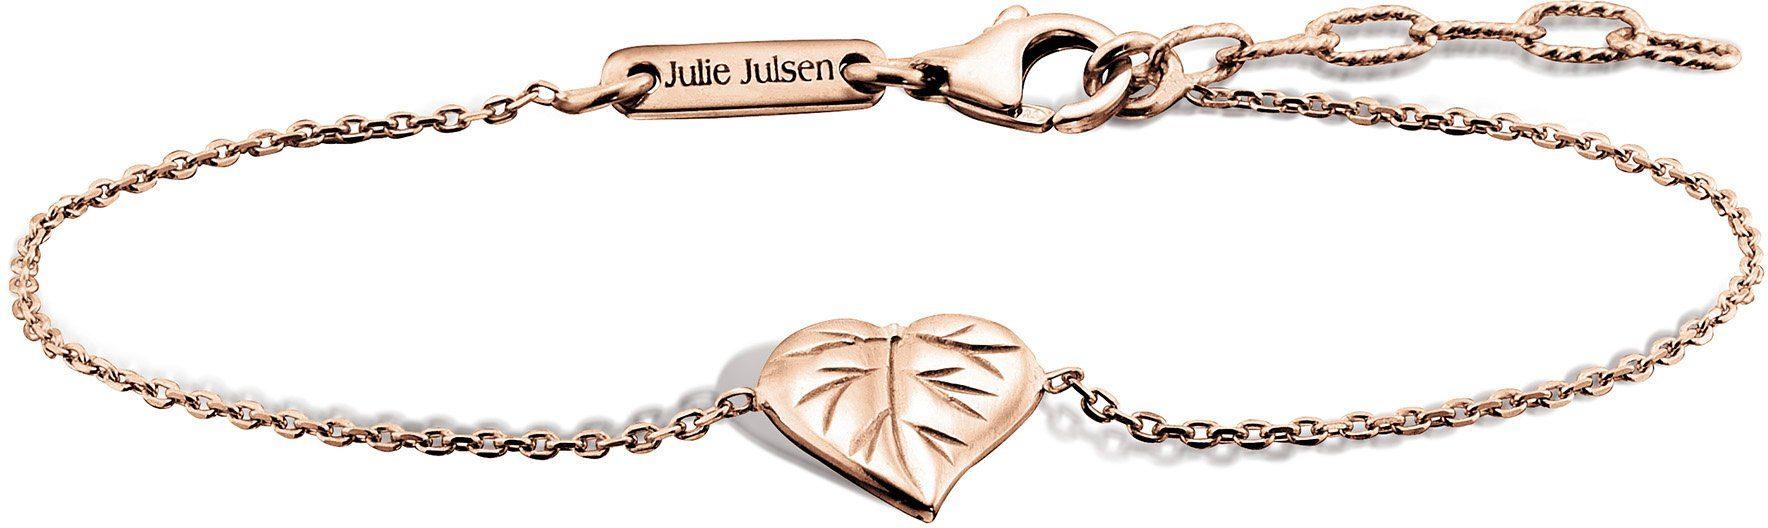 Julie Julsen Armkette, »Petite COLLECTION, Blatt, JJBR9824.2«